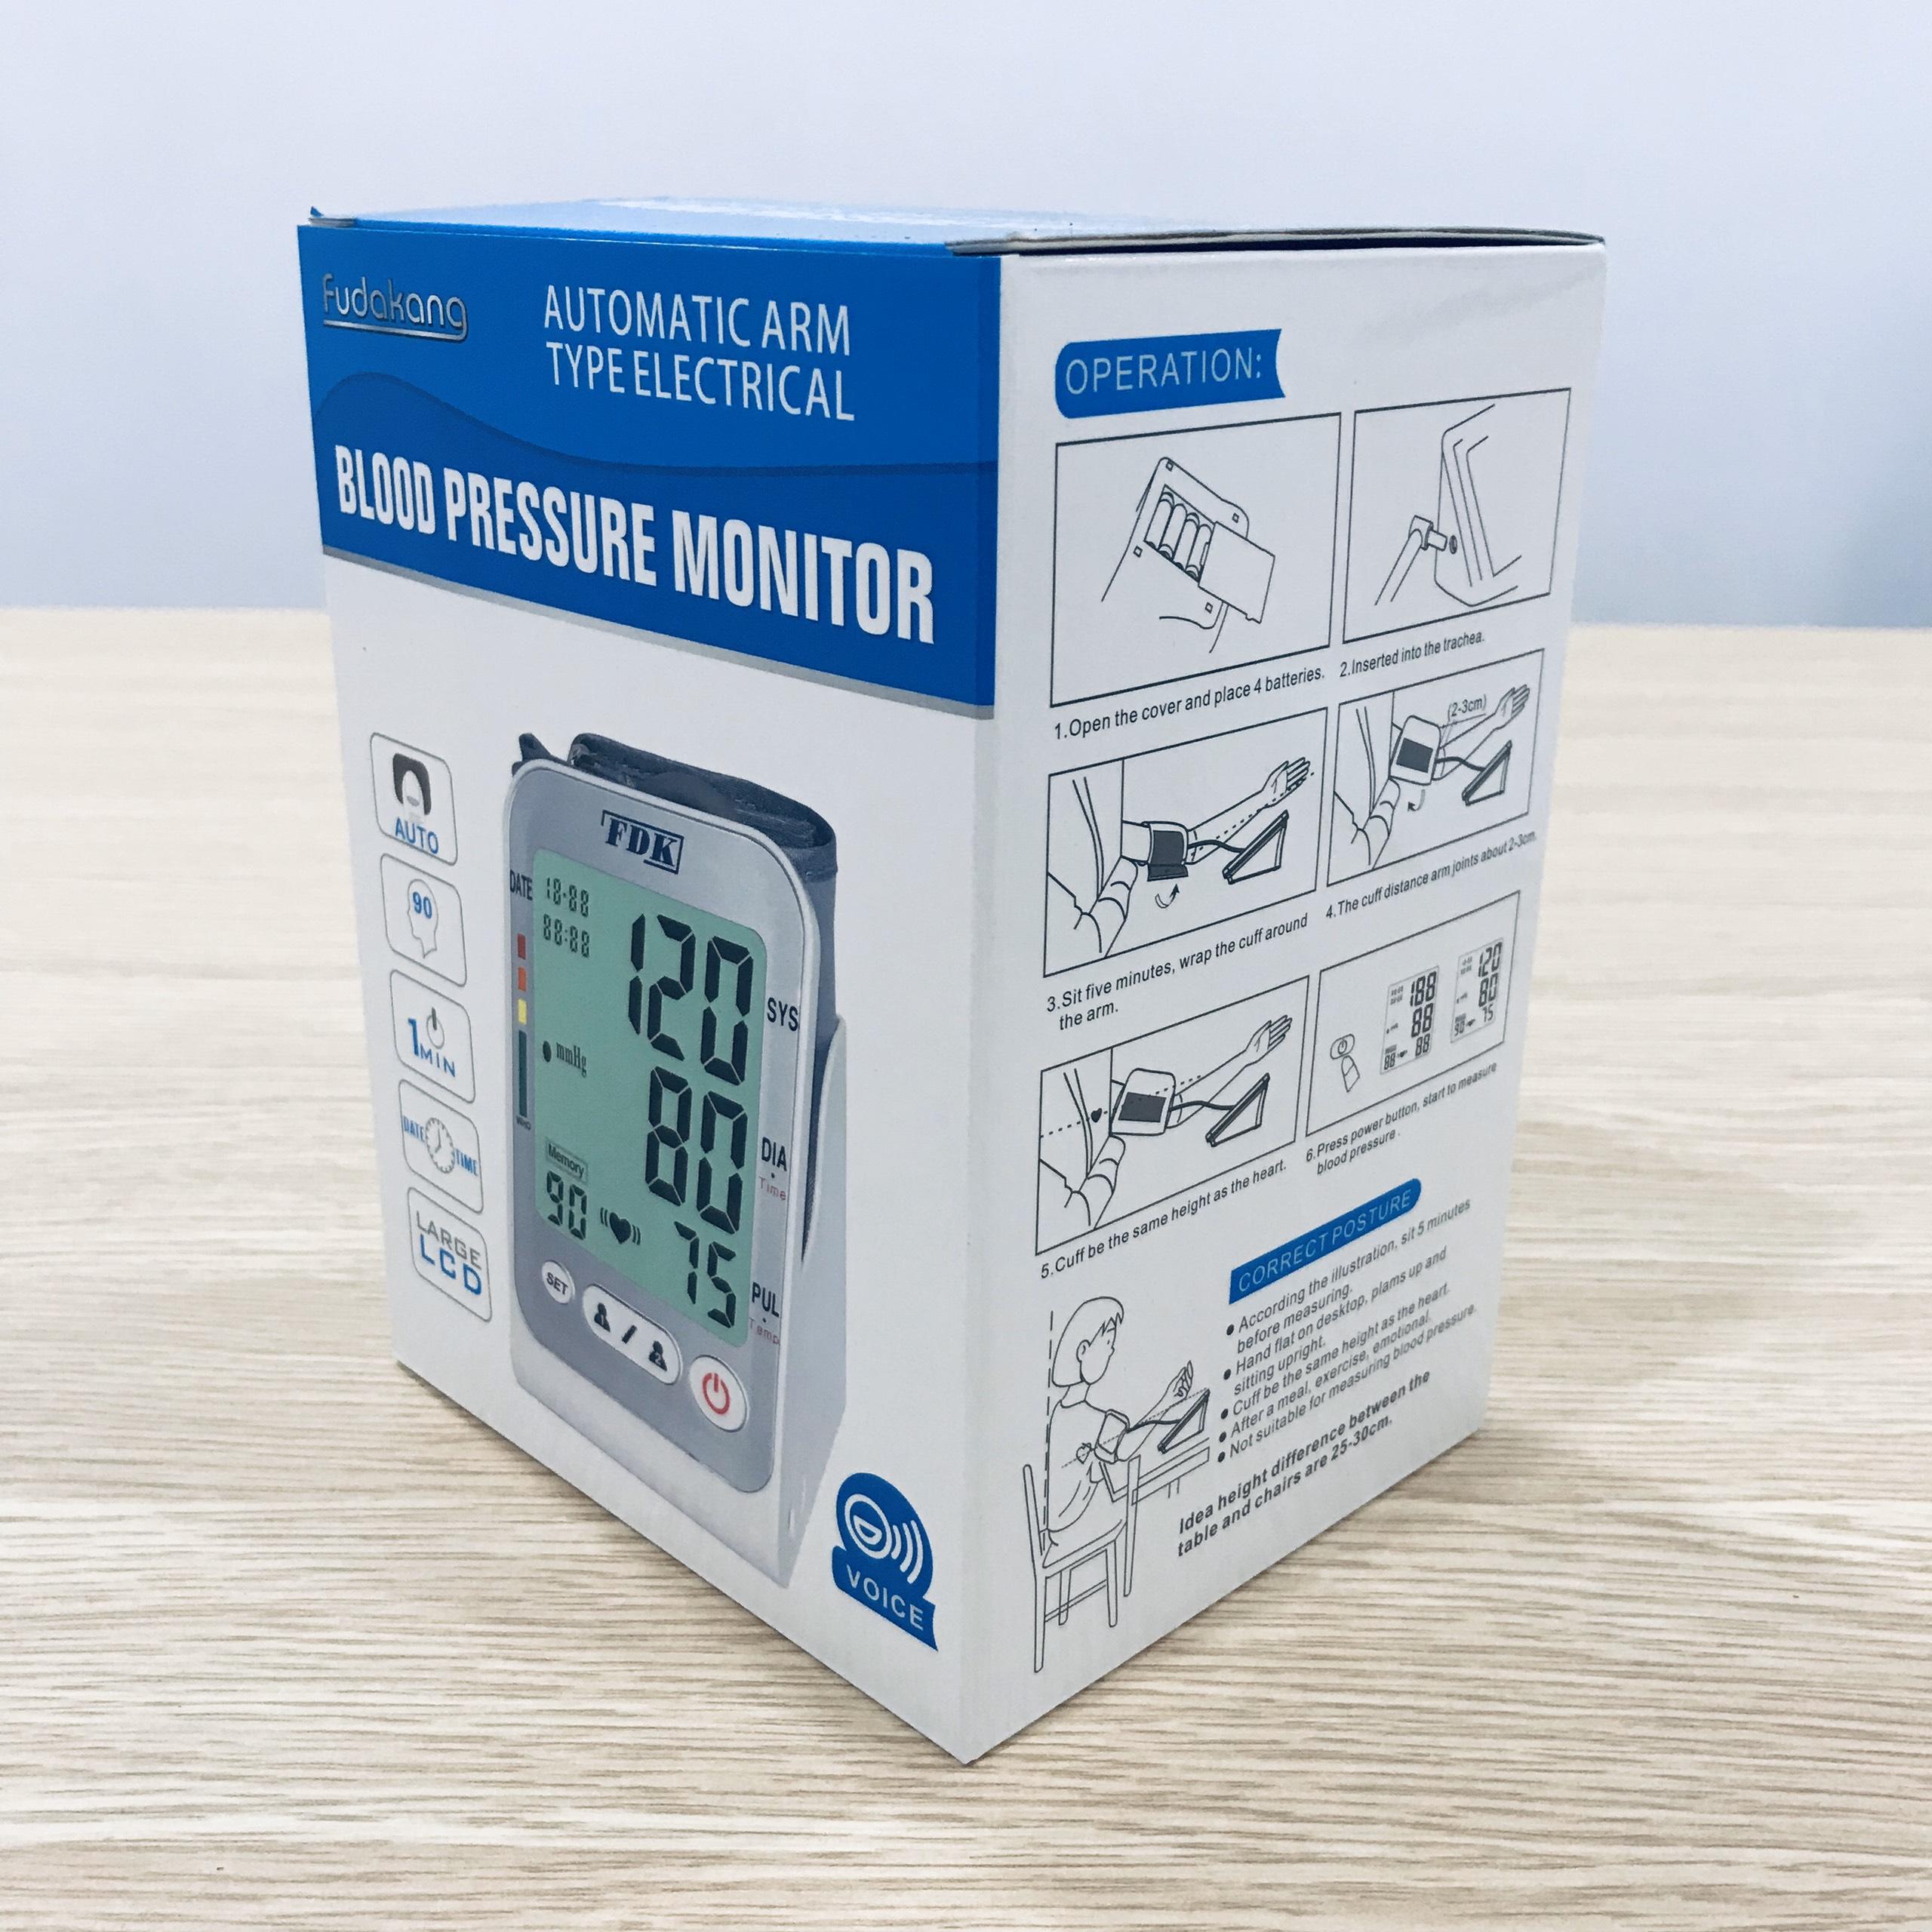 Máy đo huyết áp bắp tay FDK FT-C15Y + Tặng Bộ Đổi Nguồn